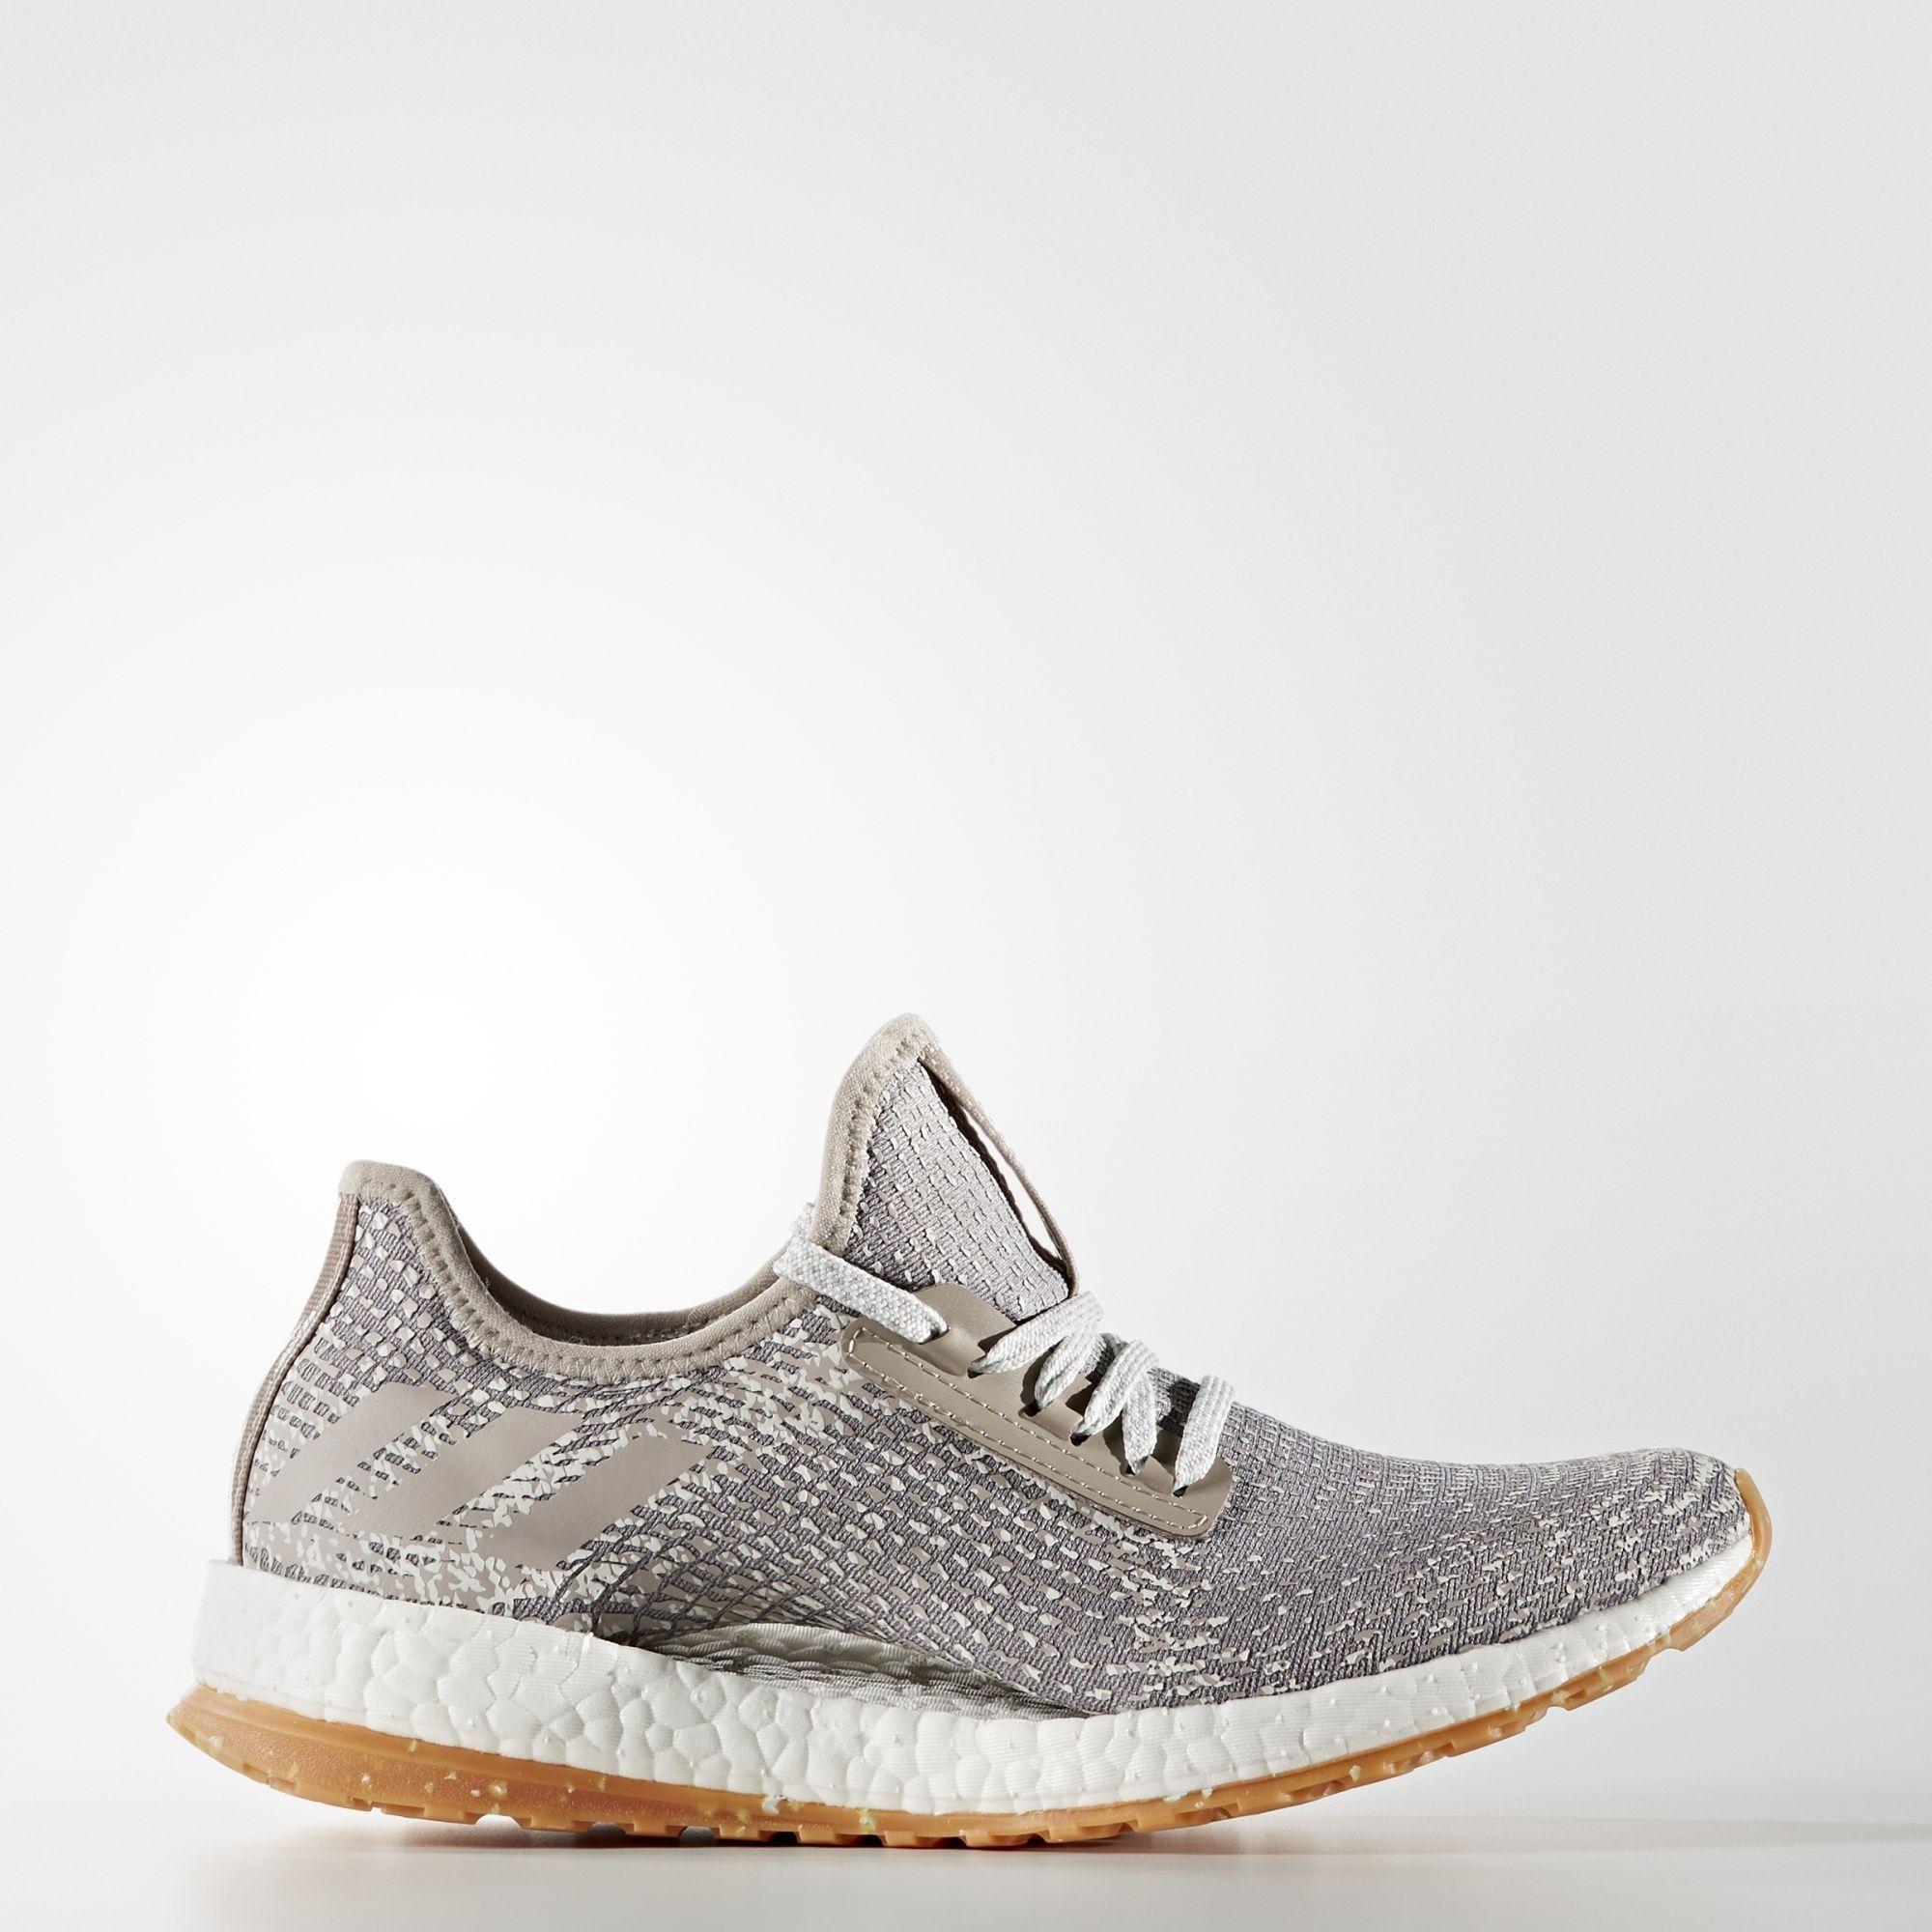 adidas superstar slip on mens yeezy boost 950 size 13